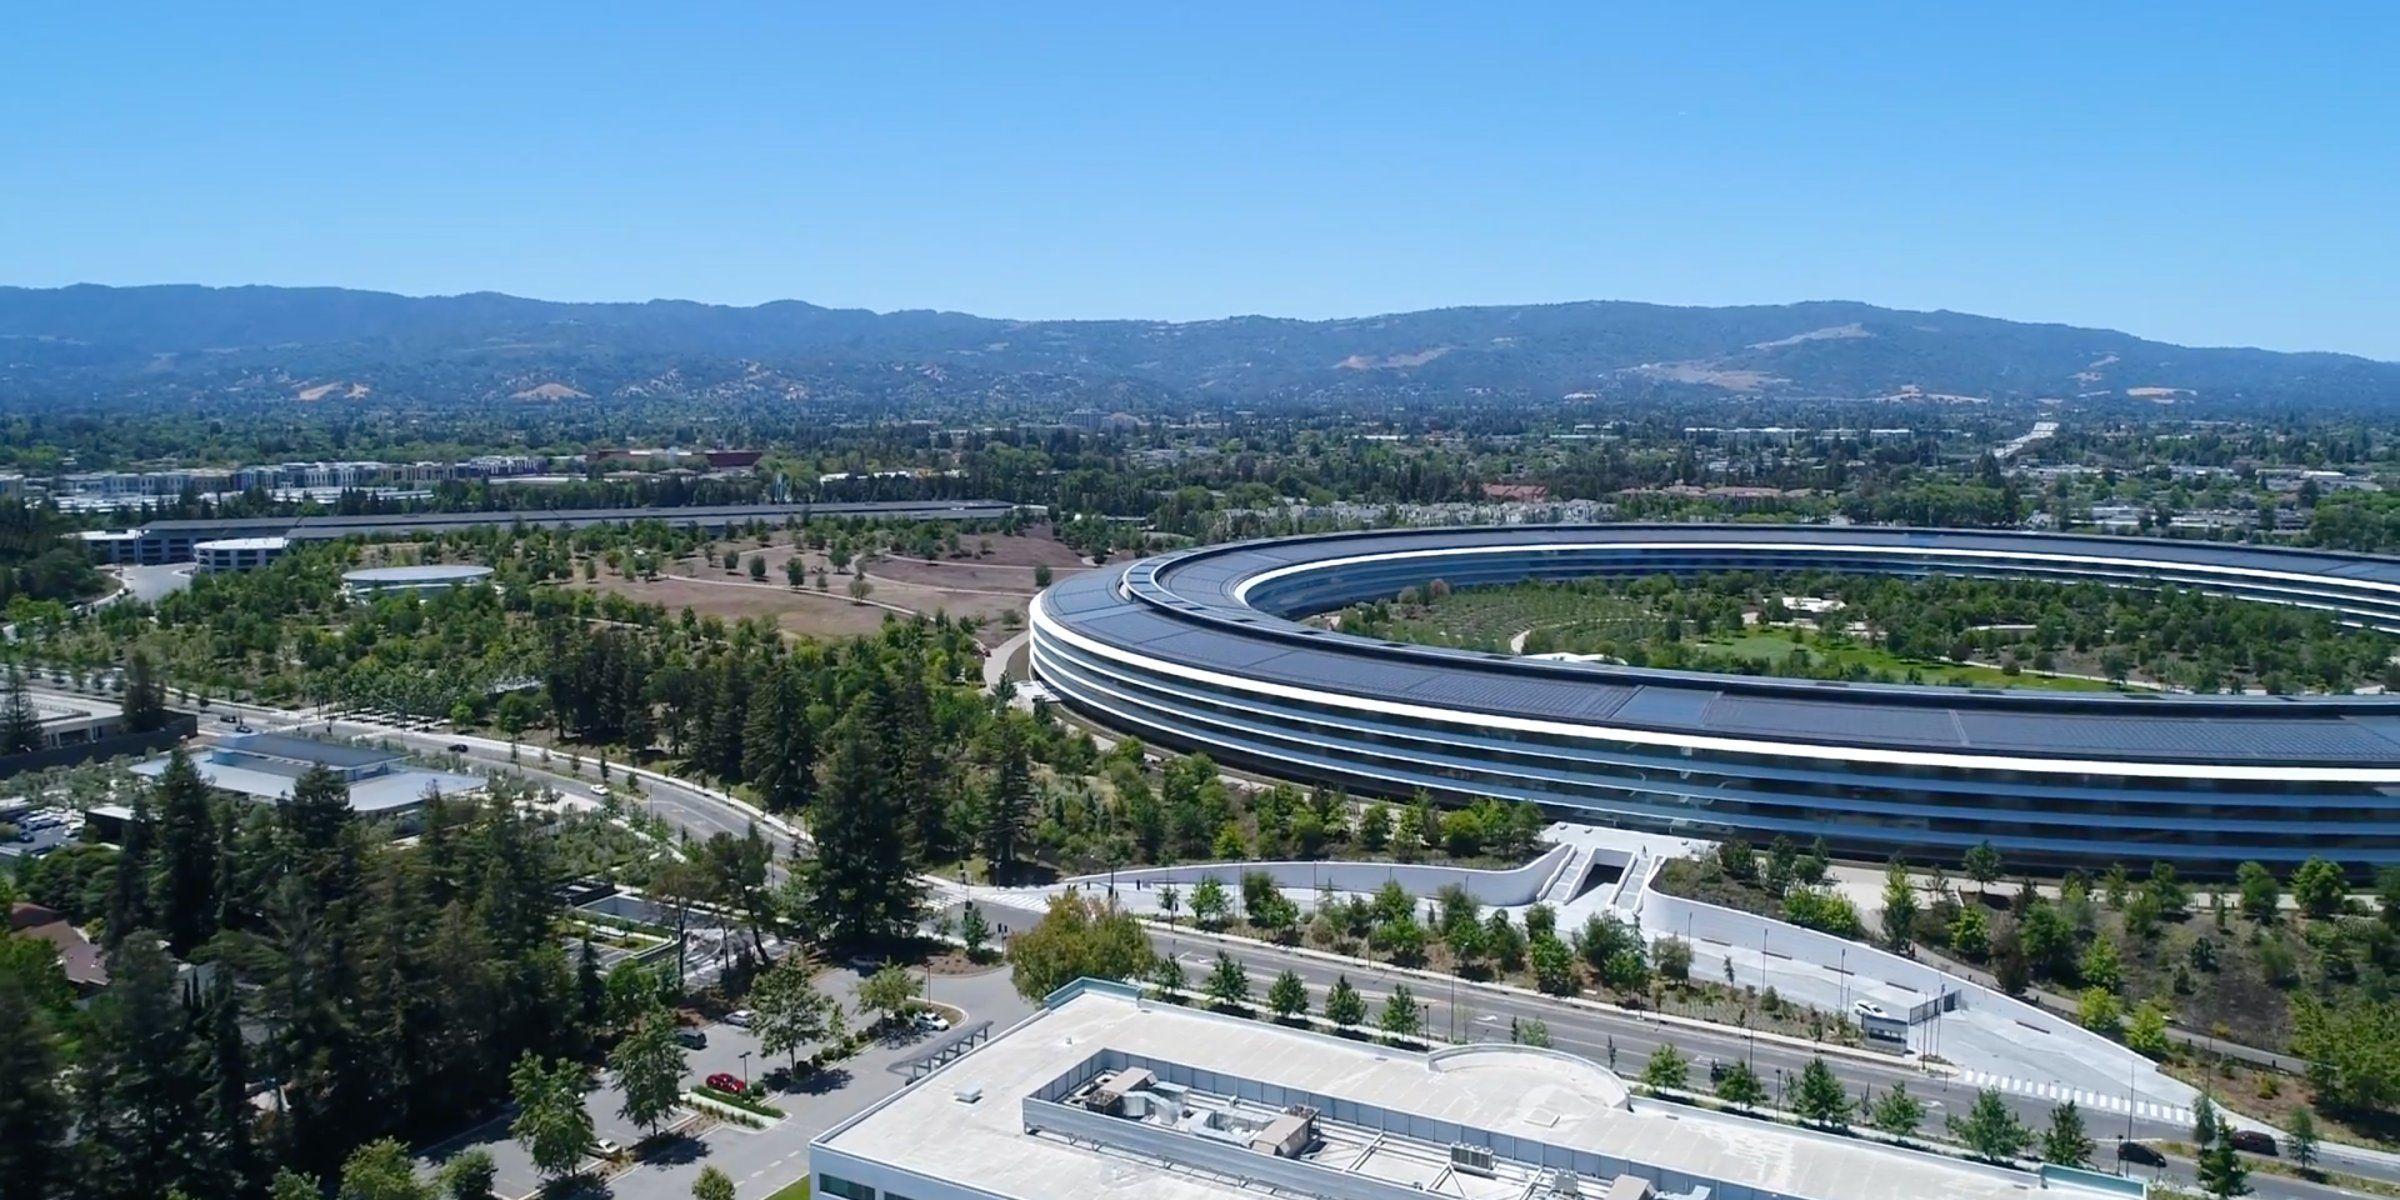 11 tips for visiting Apple's 5 billion headquarters